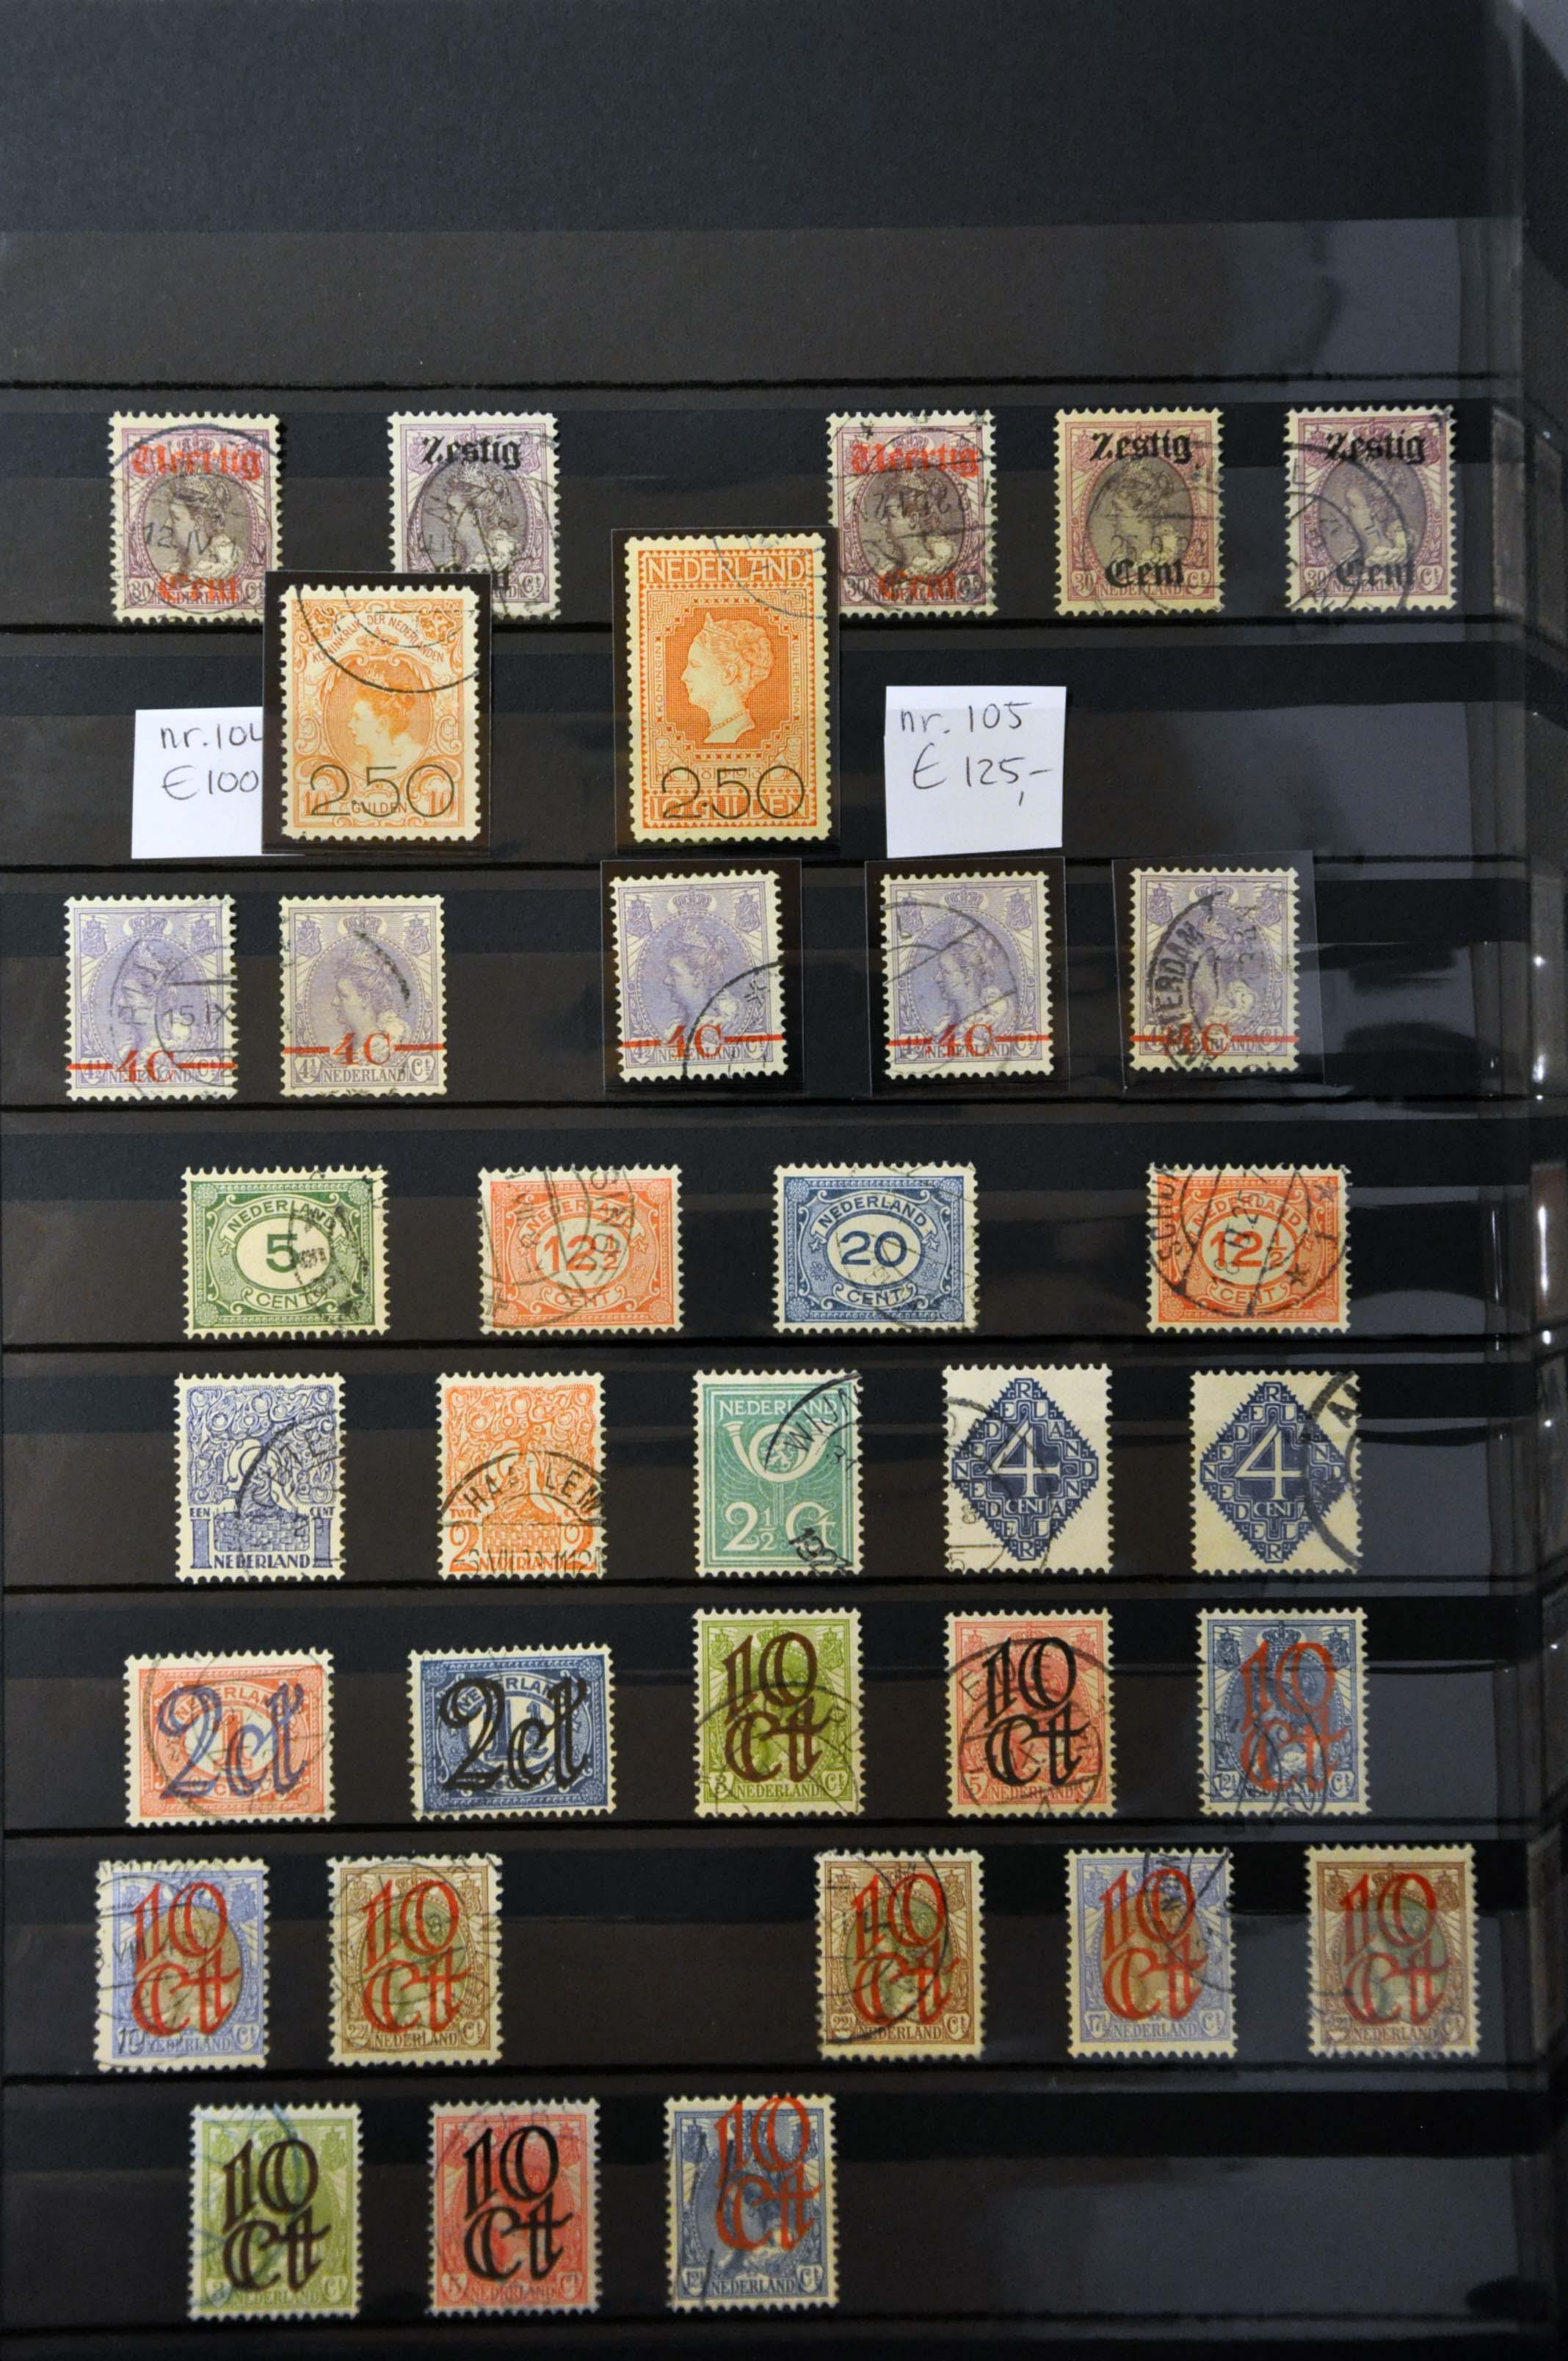 Lot 1477 - Netherlands and former colonies Netherlands -  Corinphila Veilingen Auction 239: General sale